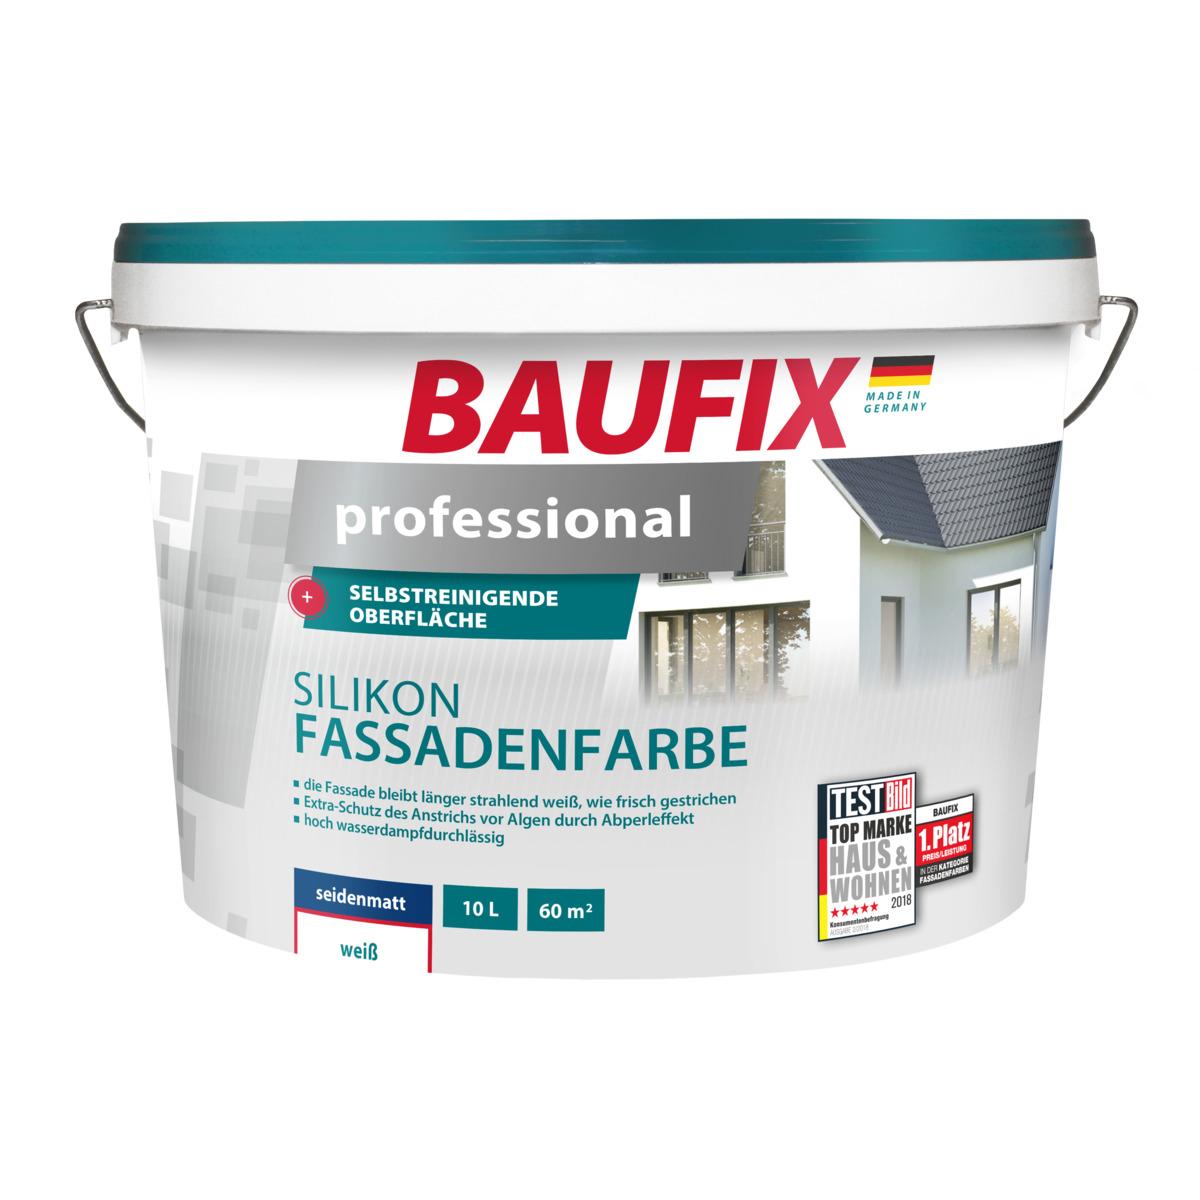 Bild 1 von BAUFIX professional Silikon-Fassadenfarbe weiß 10 L